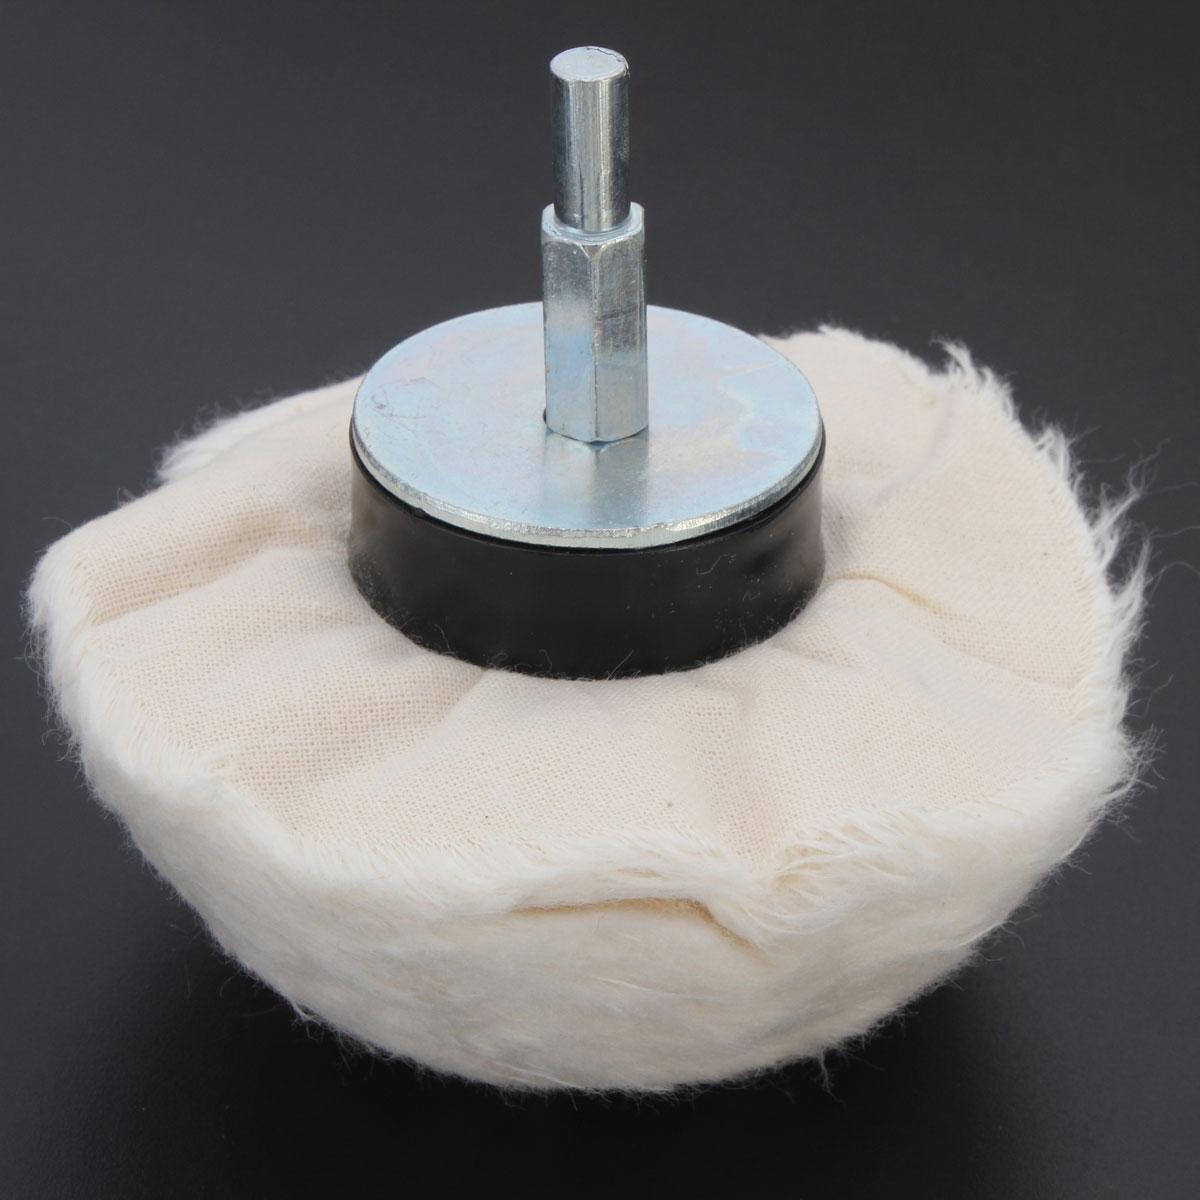 100mm 100% Cotton Dome Polishing Mop Buffing Wheel Polish Pad Polishers Drills(China (Mainland))